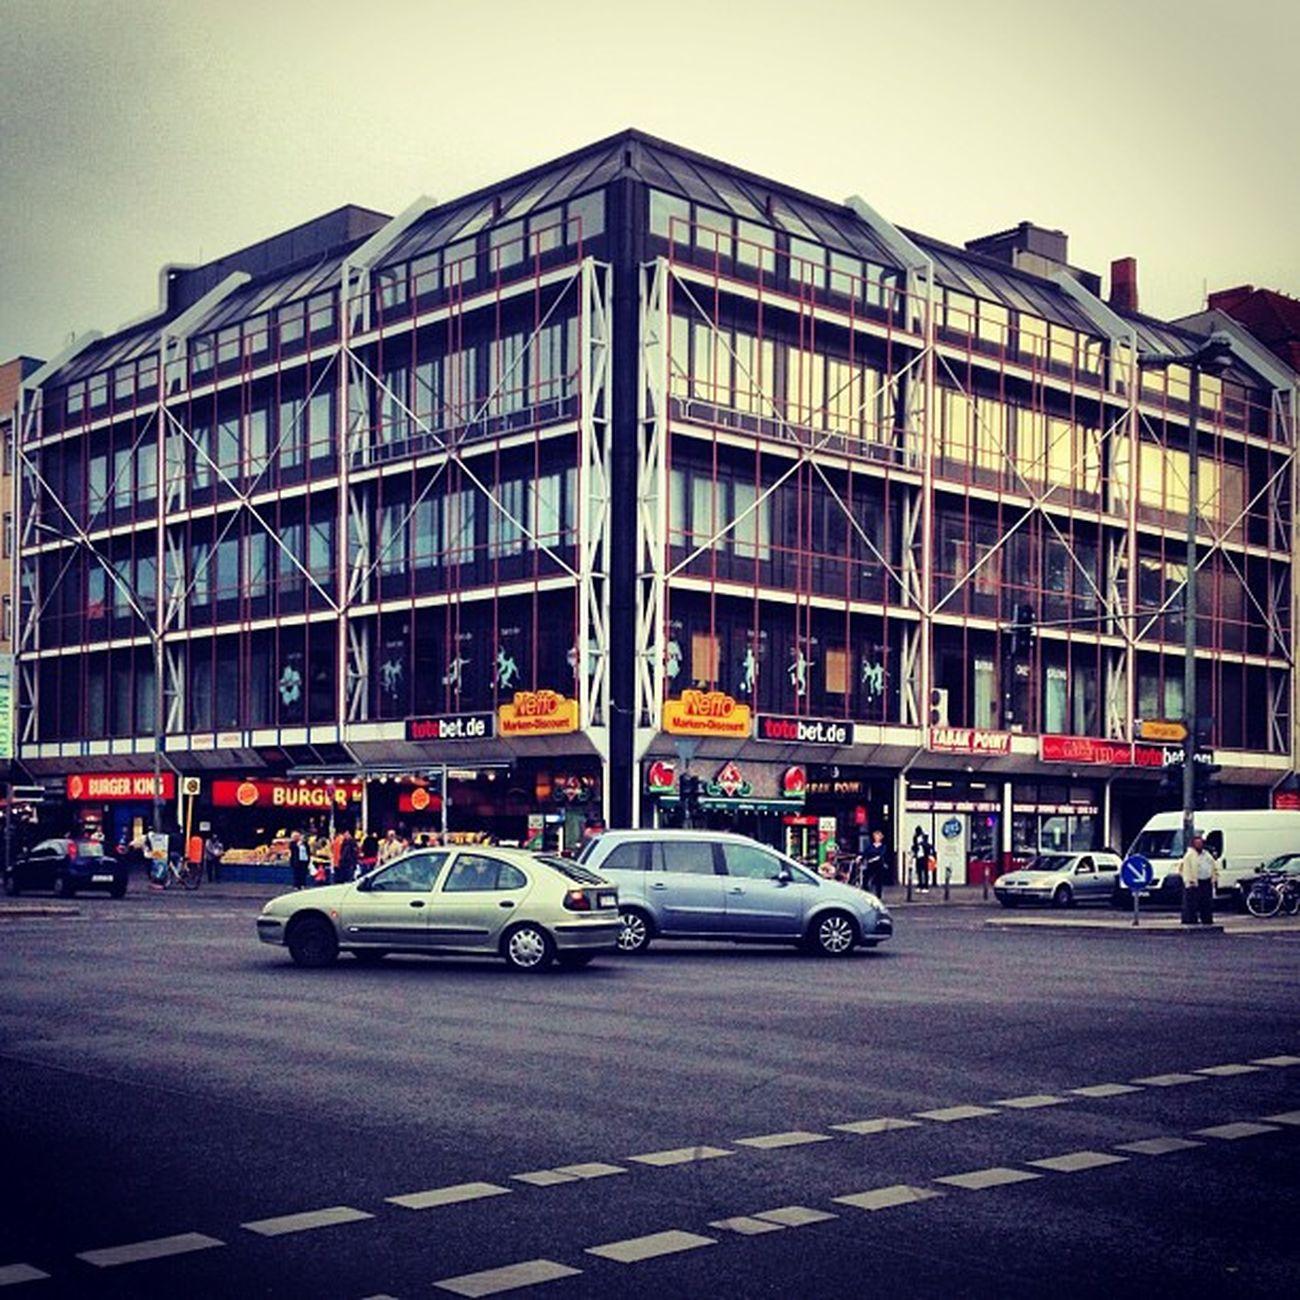 #Berlin #igersberlin #instagood #tweegram #photooftheday #follow #instamod #igers #picoftheday #instragamhub #instadaily #insta_germany #bestoftheday #igdaily #webstagram #instragramers #ig_special #igersberlin #gf_germany #leopoldplatz Instagood Webstagram Instadaily Igersberlin Insta_germany Gf_germany Instragramers Ig_special Berlin Instragamhub Photooftheday Instamod Picoftheday Leopoldplatz Follow Bestoftheday Igers IGDaily Tweegram